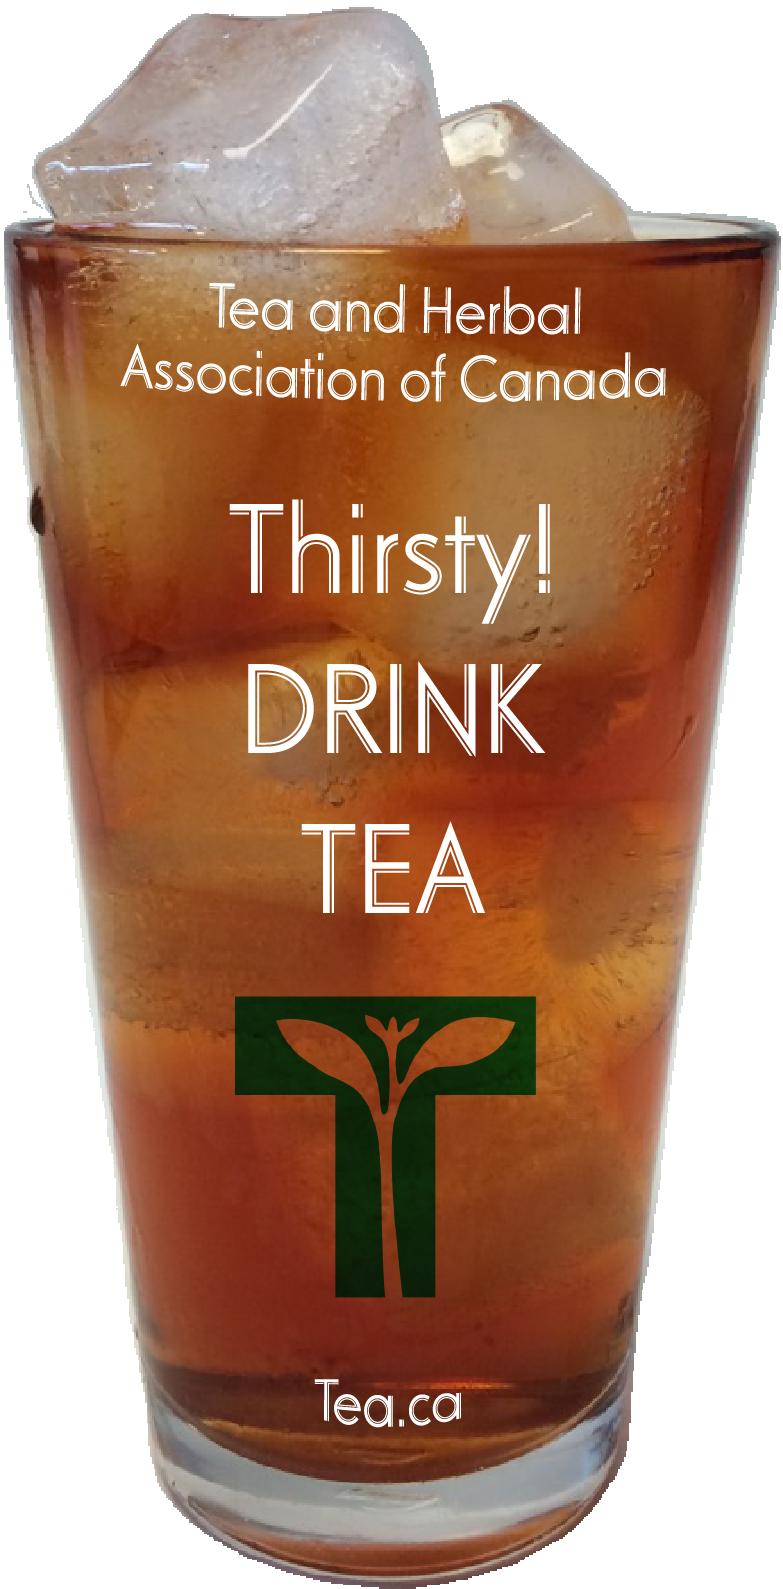 Thirsty! Drink Tea!